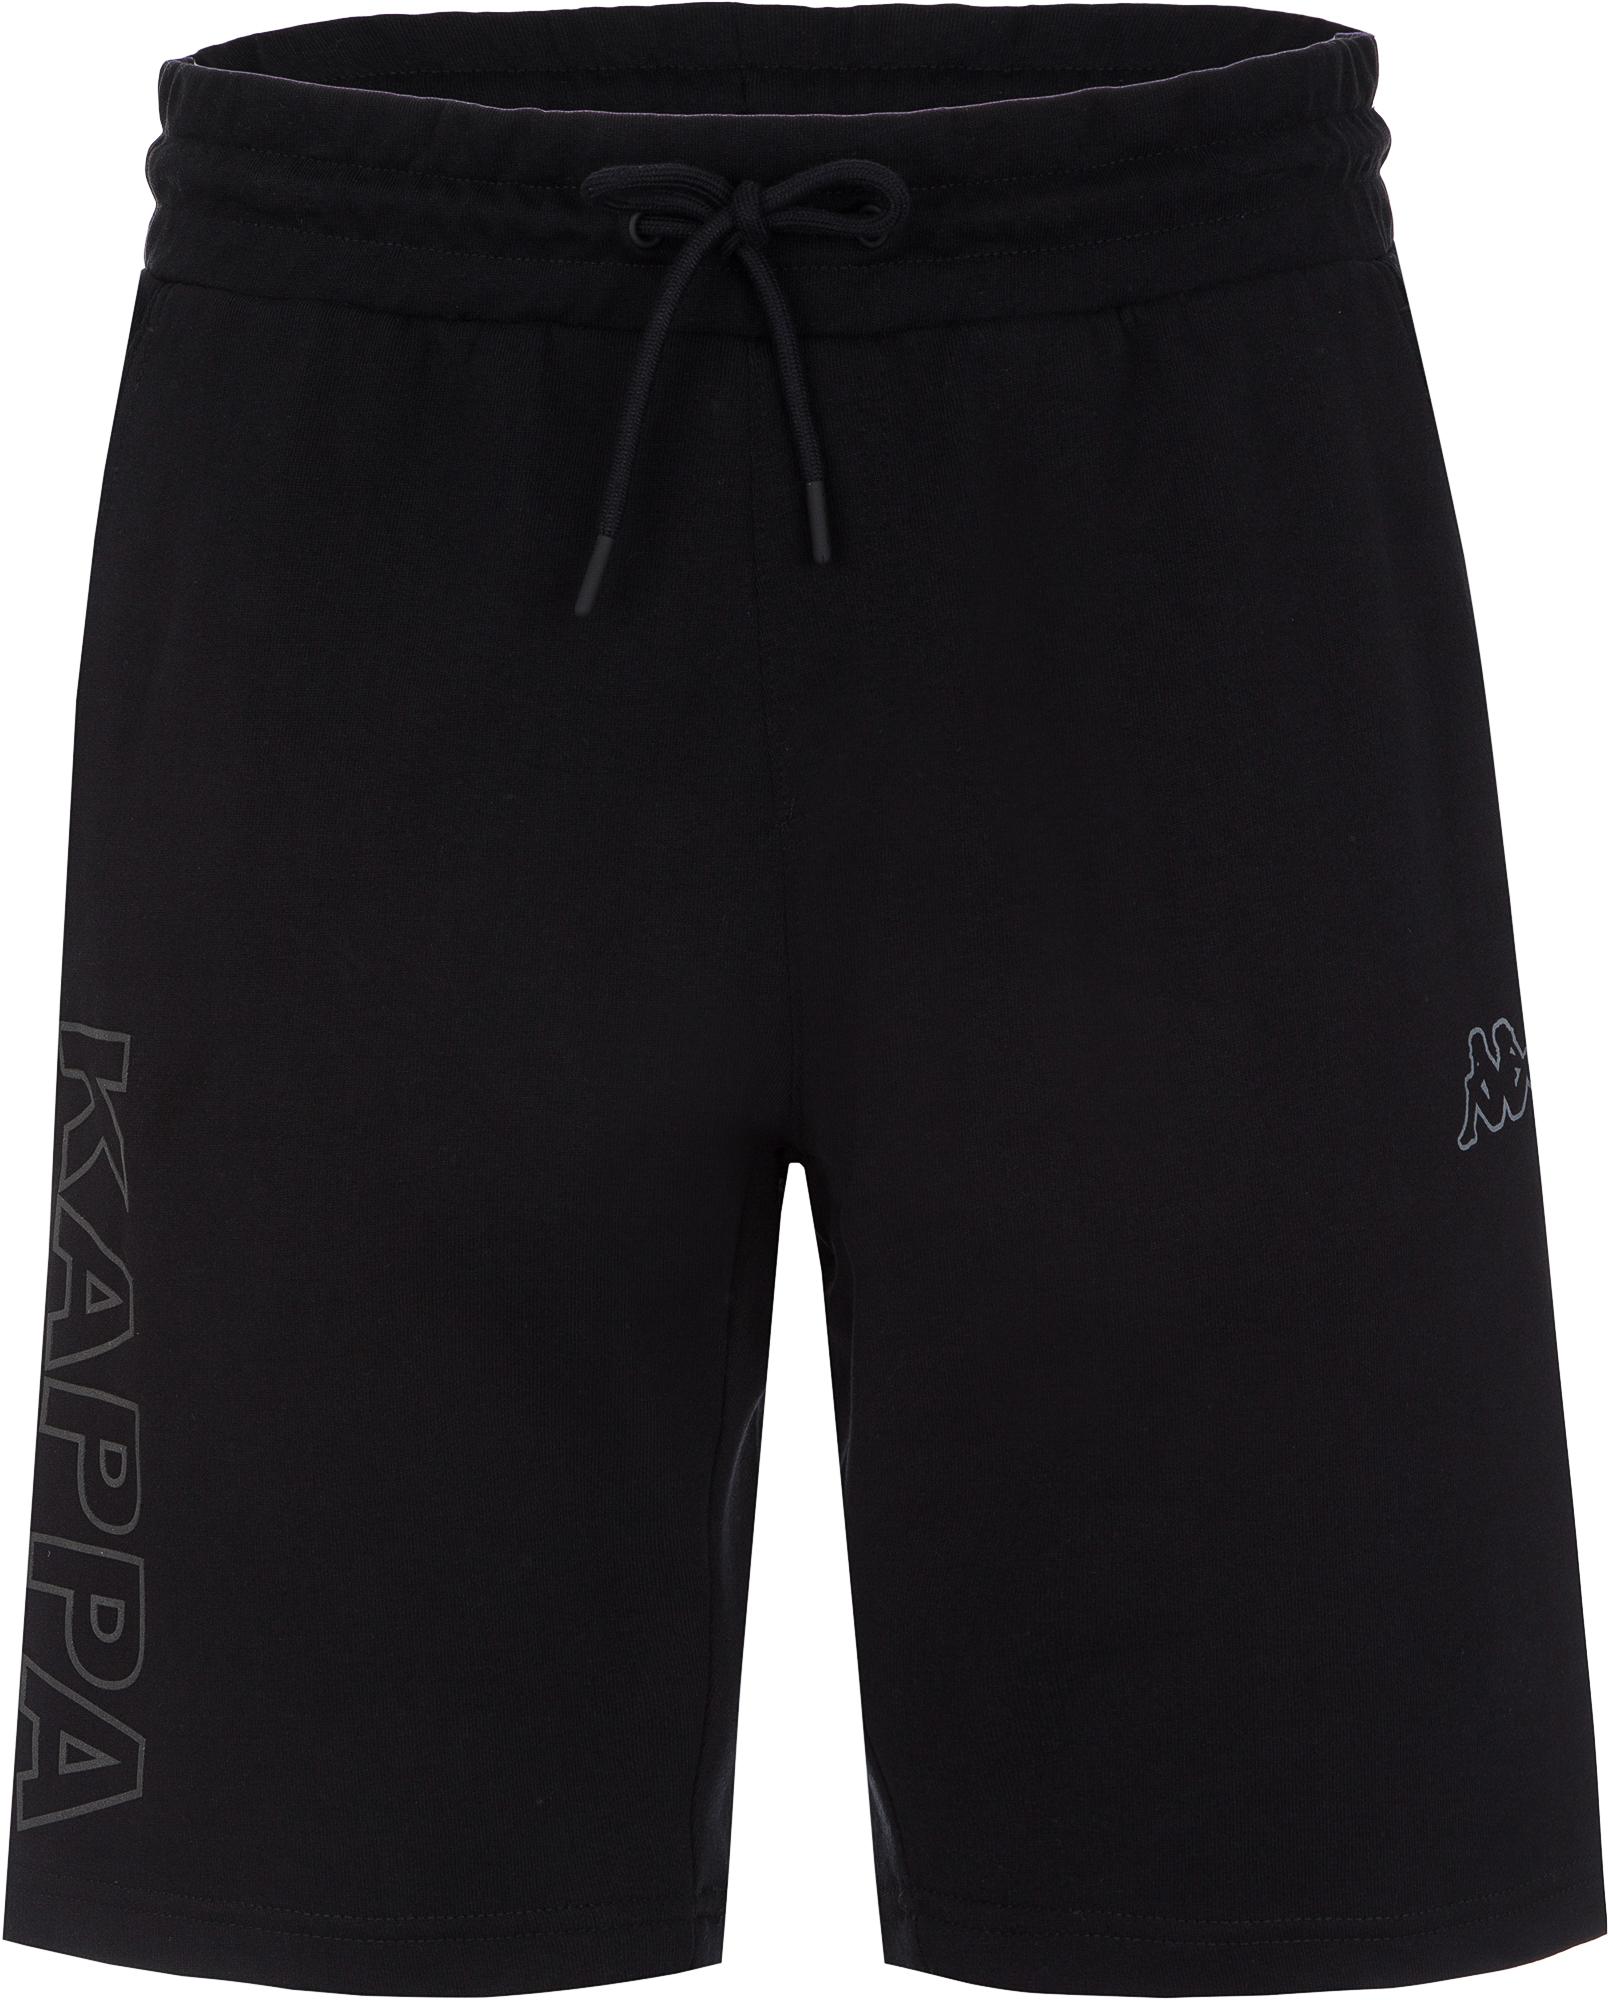 Kappa Шорты мужские Kappa, размер 52 шорты для девочки kappa цвет темно серый 3032ne0 4a размер 140